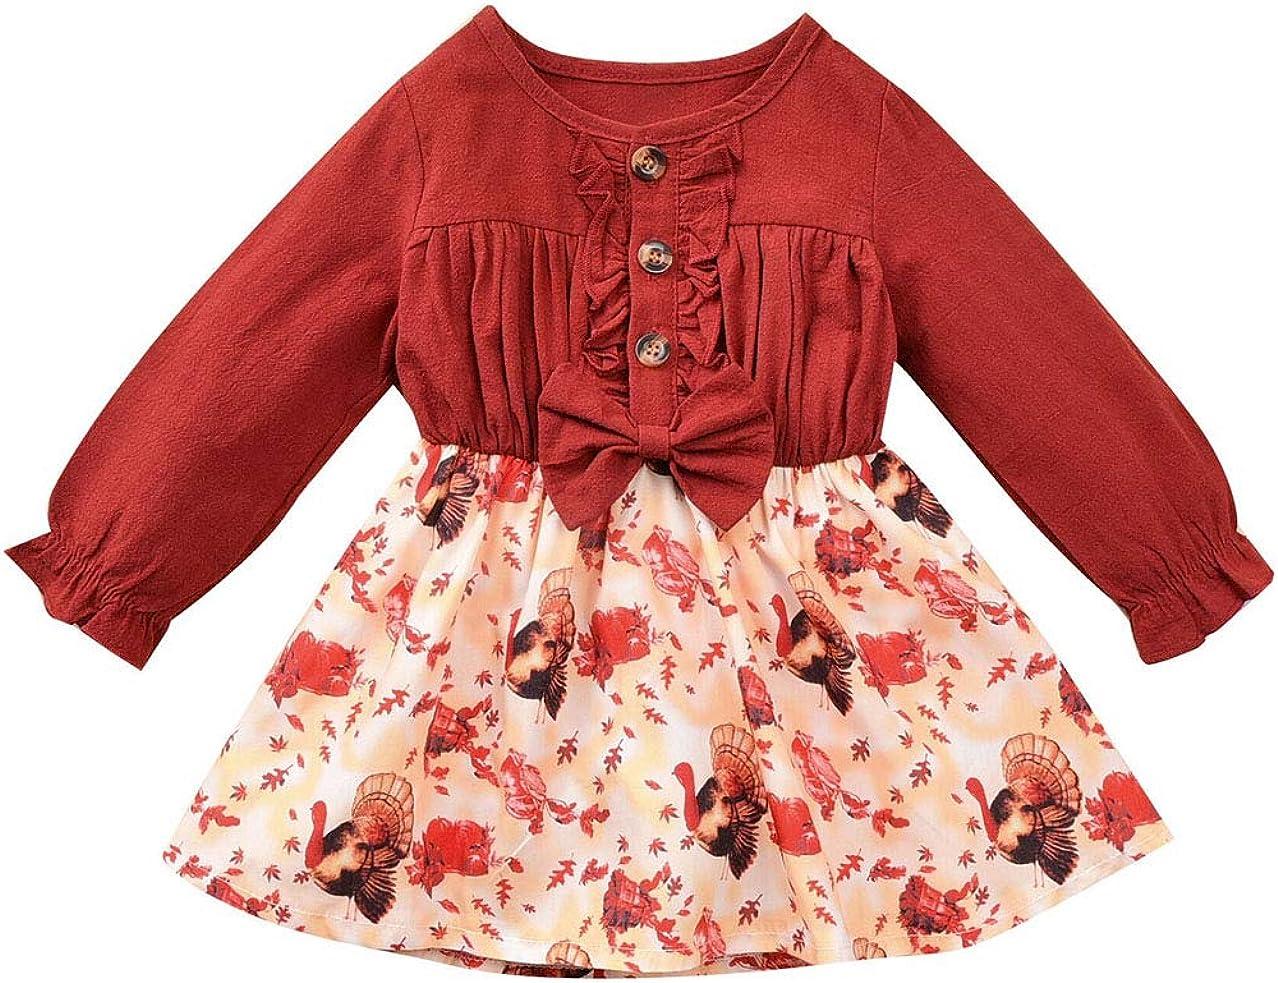 JOJOJUJU Newborn Toddler Baby 40% OFF Cheap Sale Max 87% OFF Girls Thanksgiving Dress Ruffle Lo